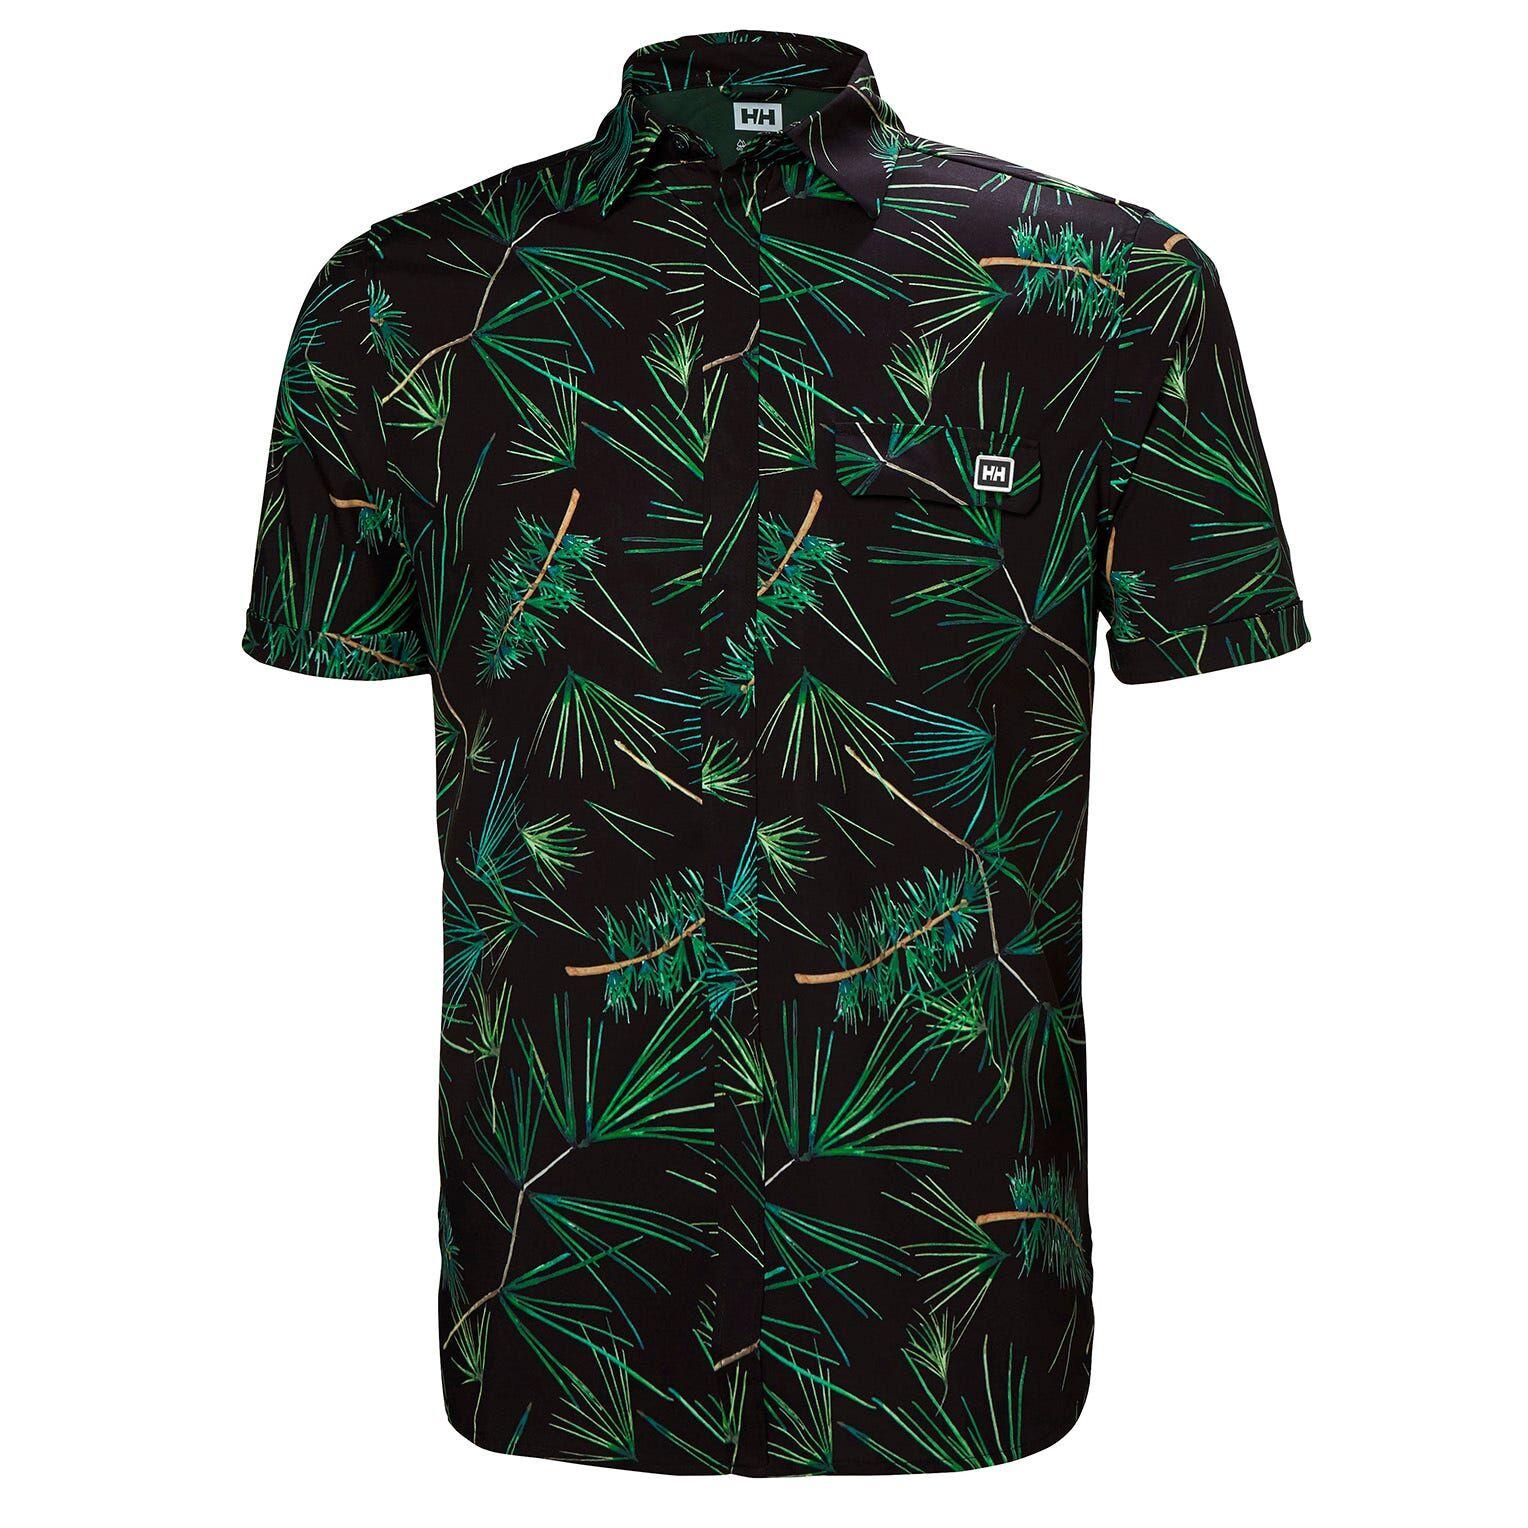 Helly Hansen Oya Shirt Black S